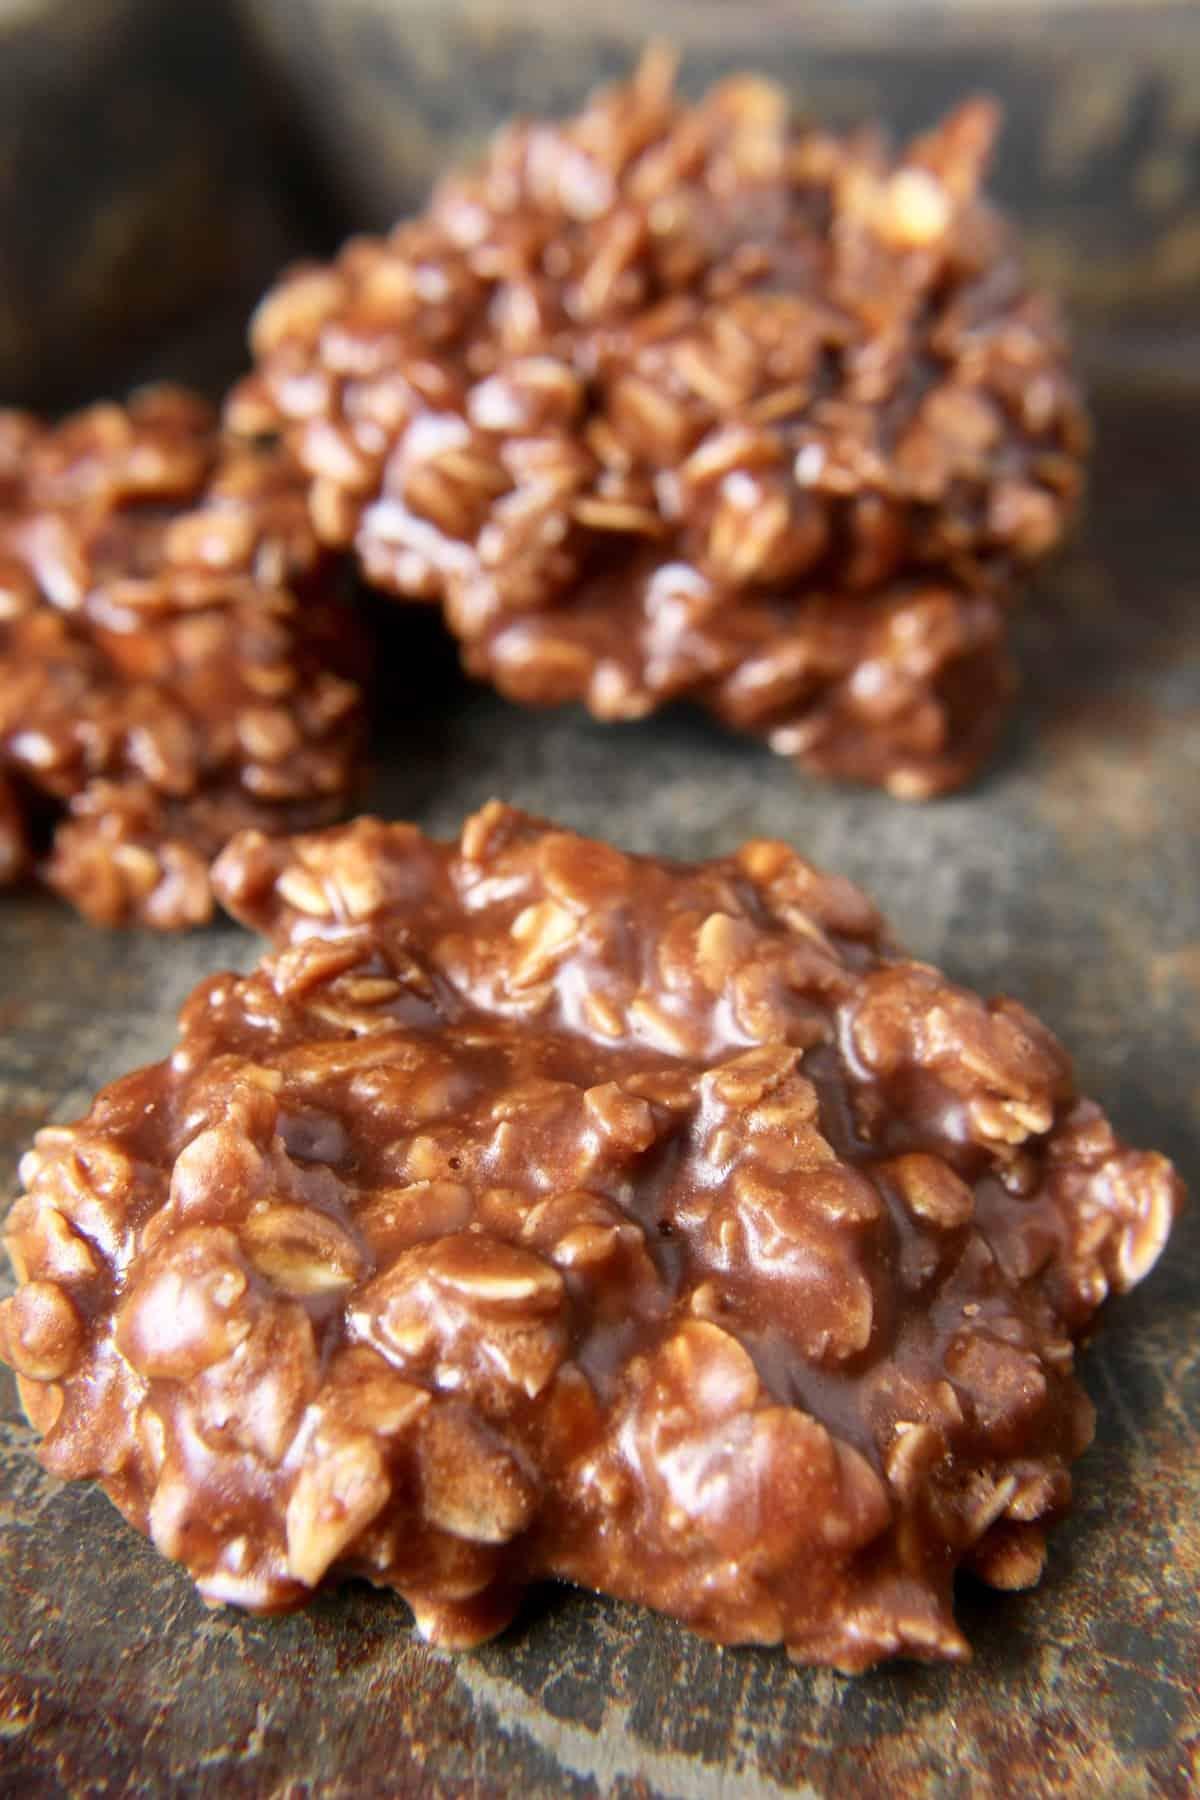 Coconut Oil No-Bake Cookies